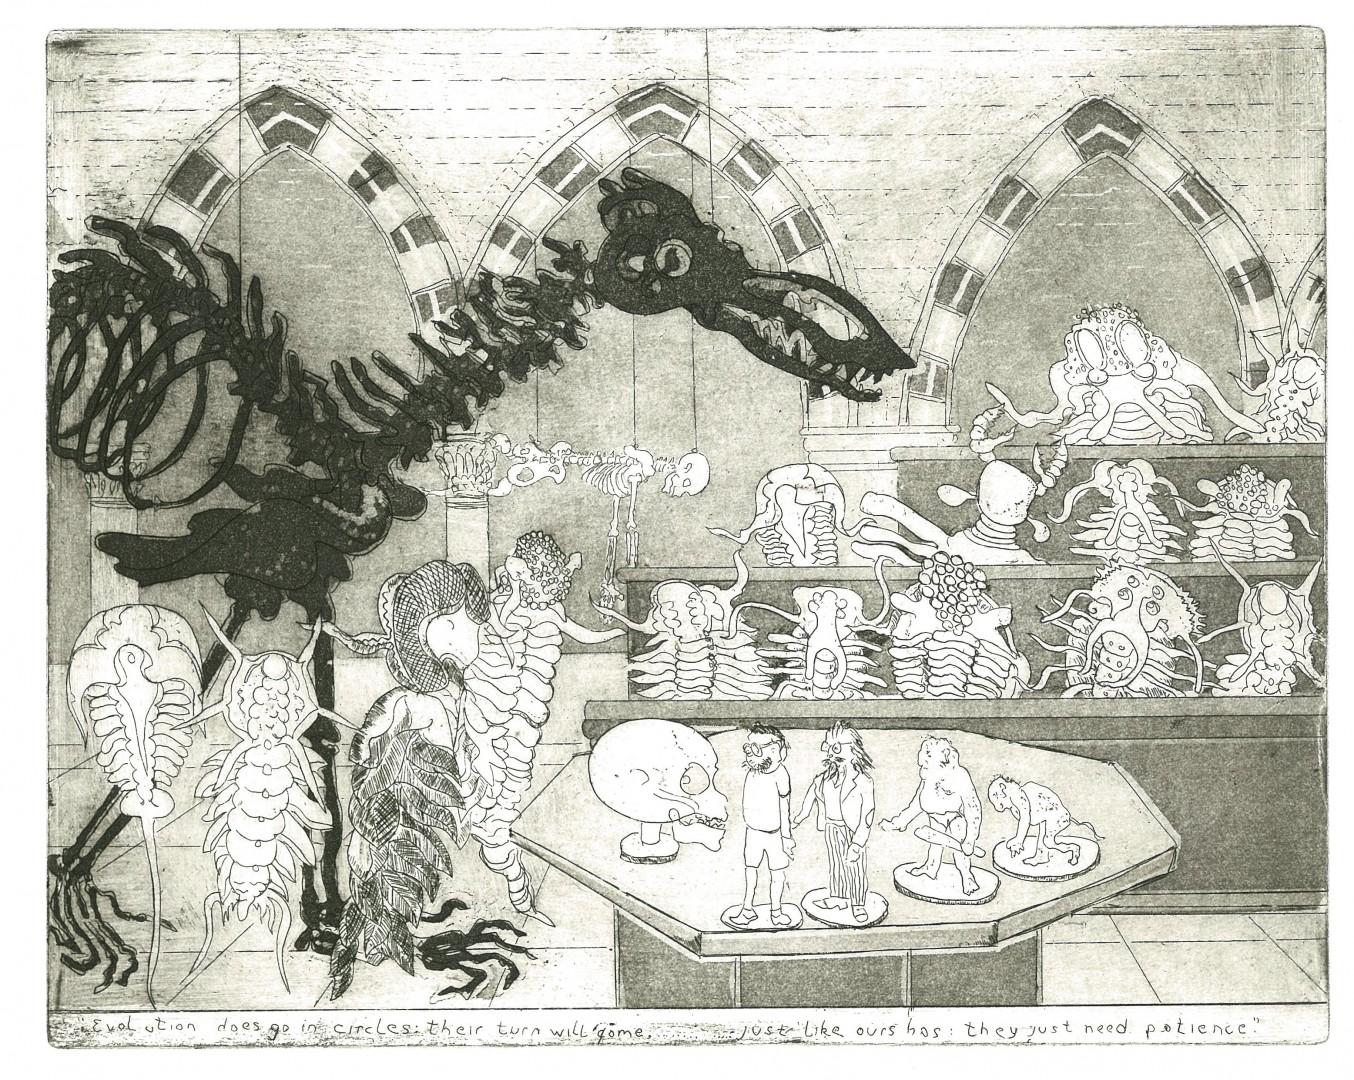 Professor Trilobite's Lecture by John Dew